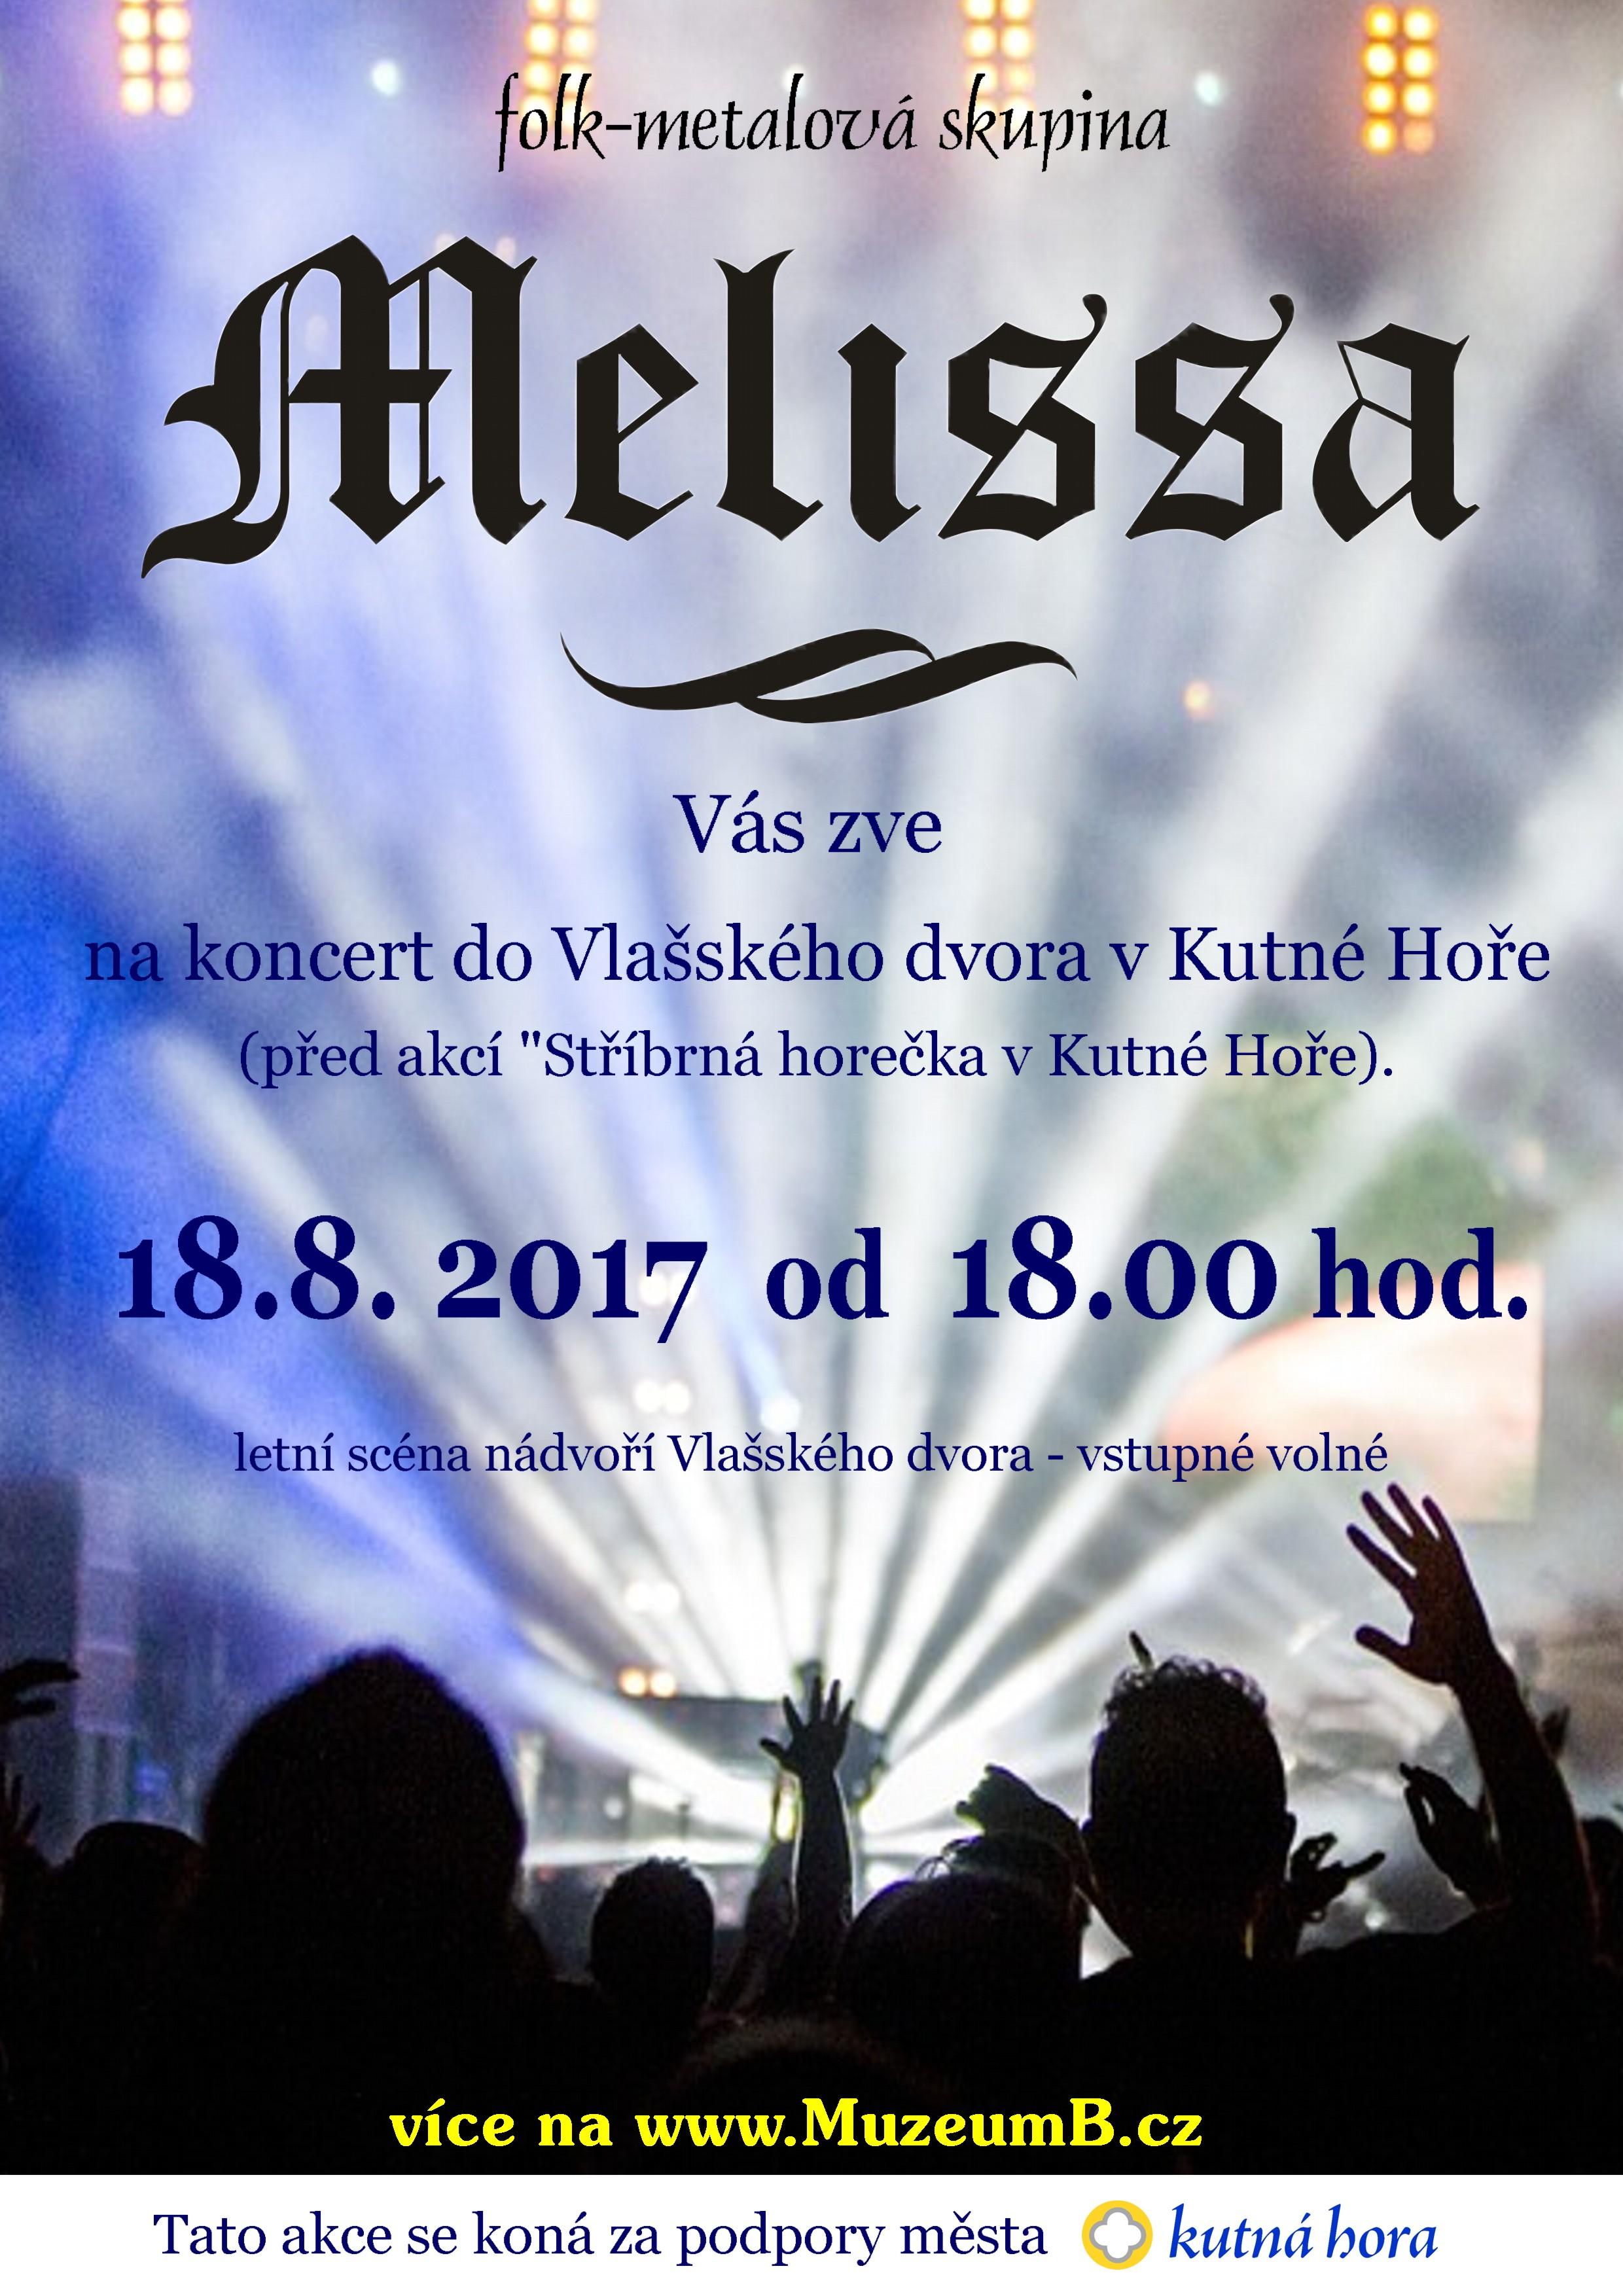 2407-melissa-koncert-jpg.jpg